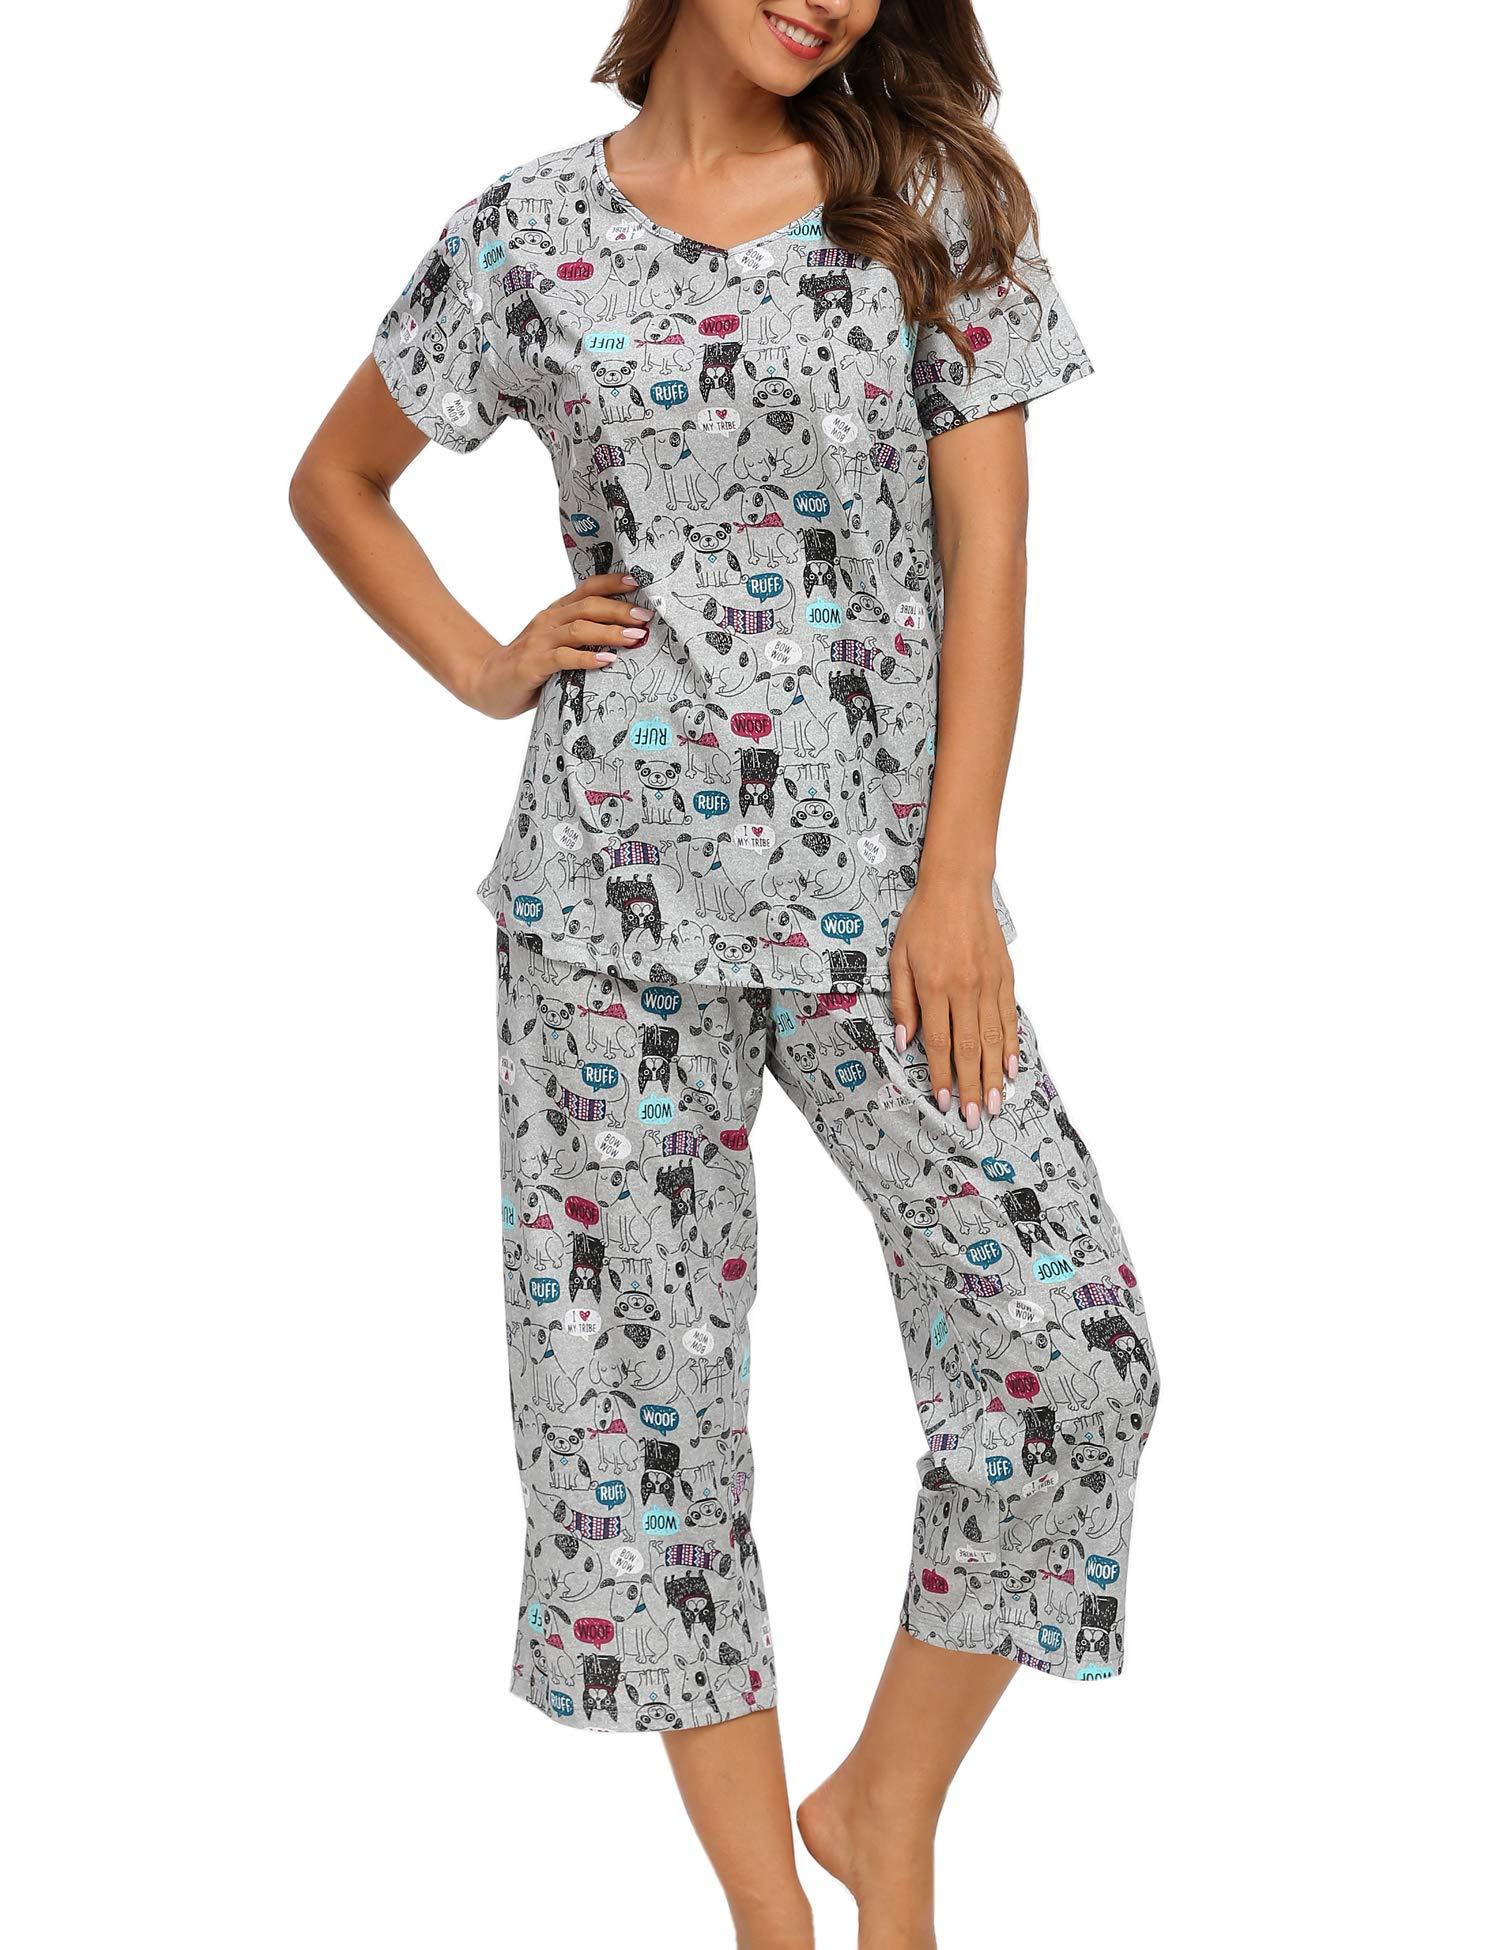 ENJOYNIGHT Women\'s Cute Sleepwear Tops with Capri Pants Pajama Sets (Dog, Medium)